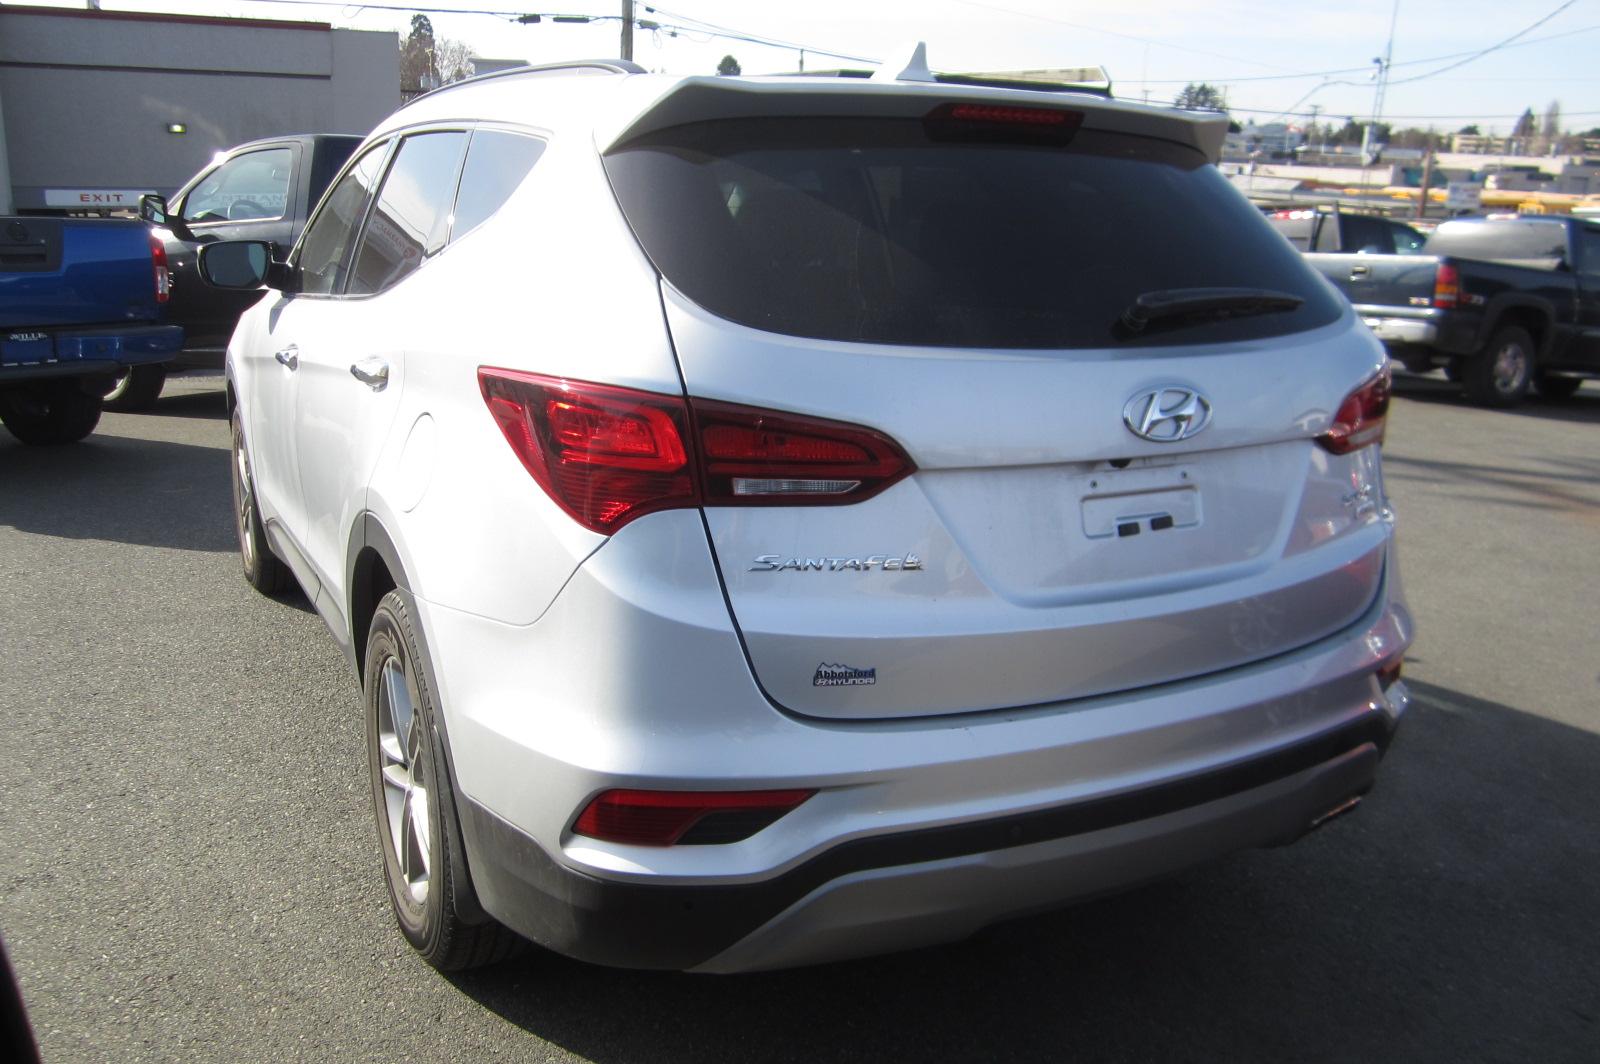 Used 2017 Hyundai Santa Fe in Victoria,BC